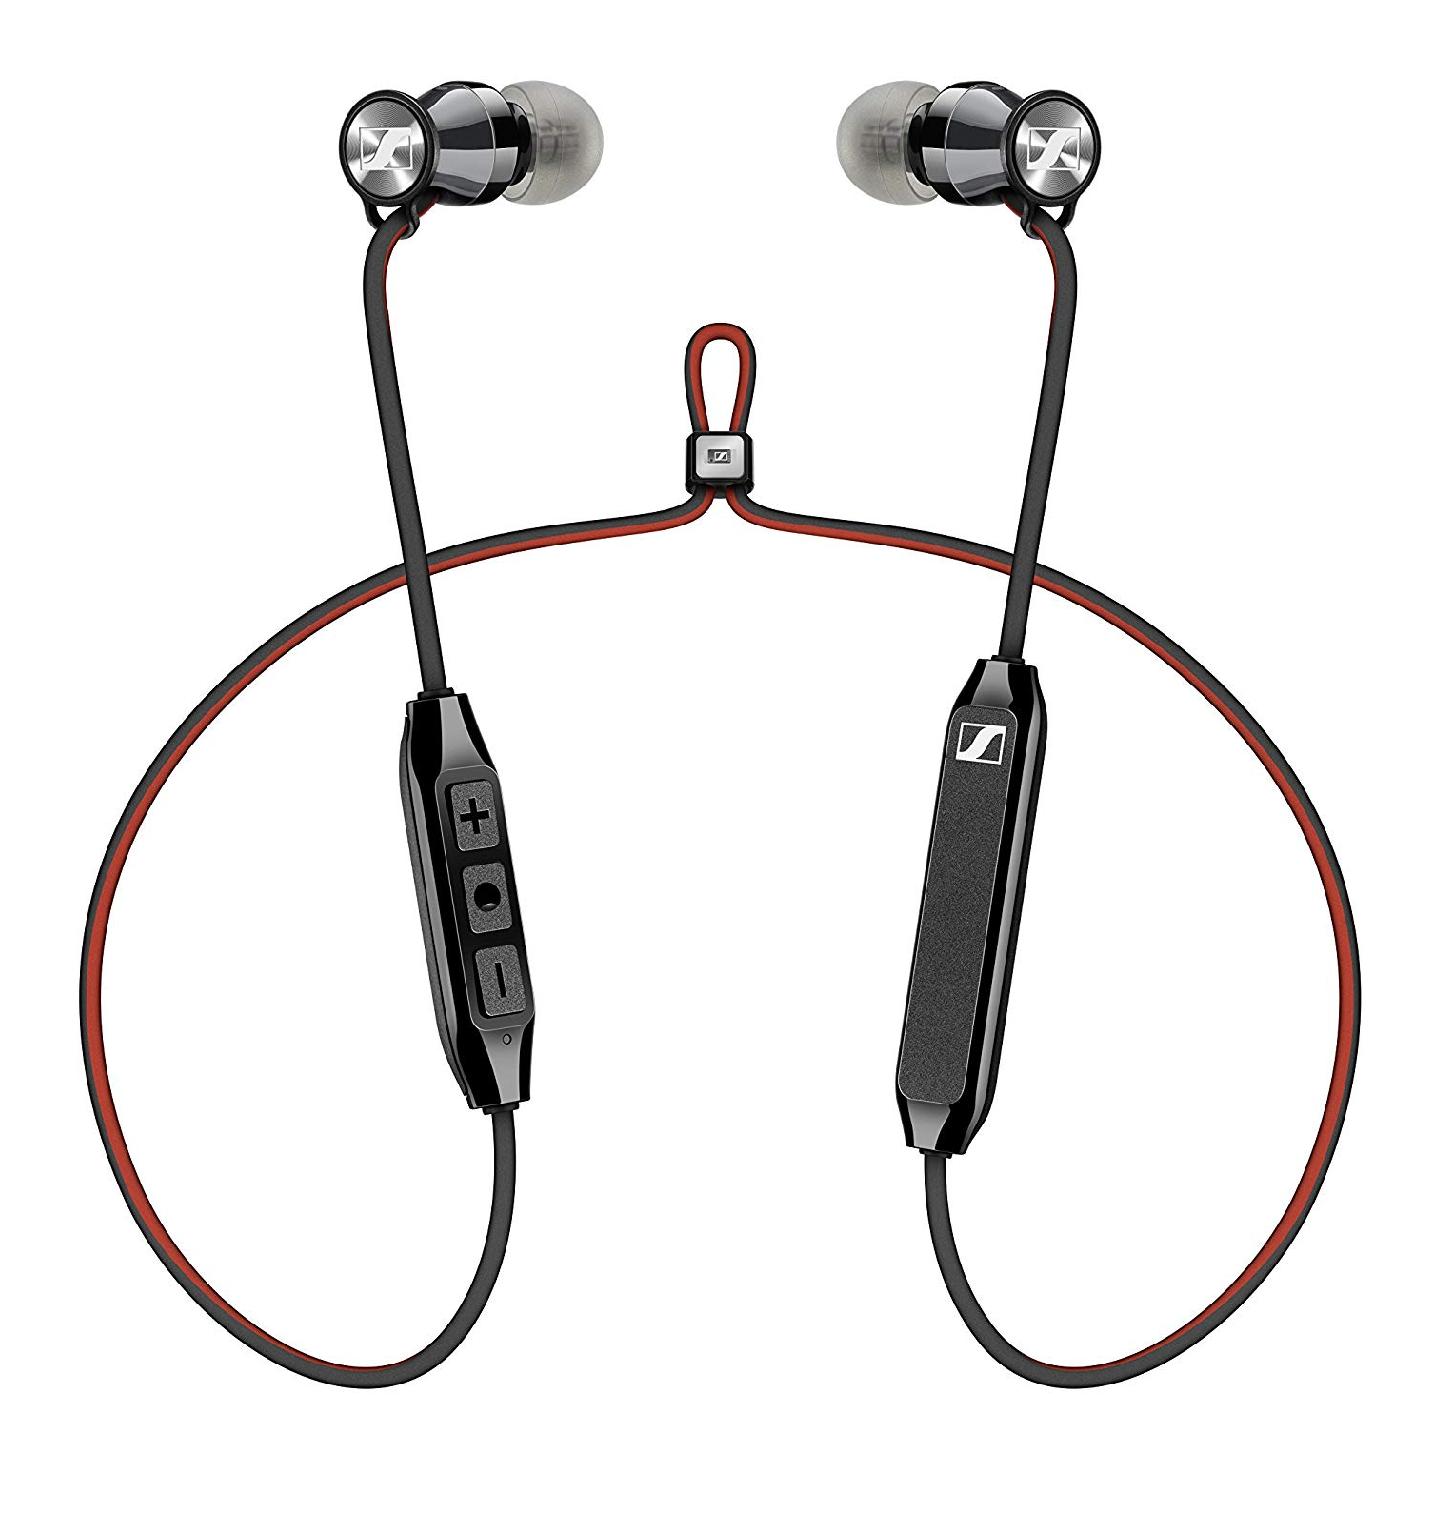 Sennheiser Momentum Free, Wireless Bluetooth Headphones - Black at Amazon for £134.95